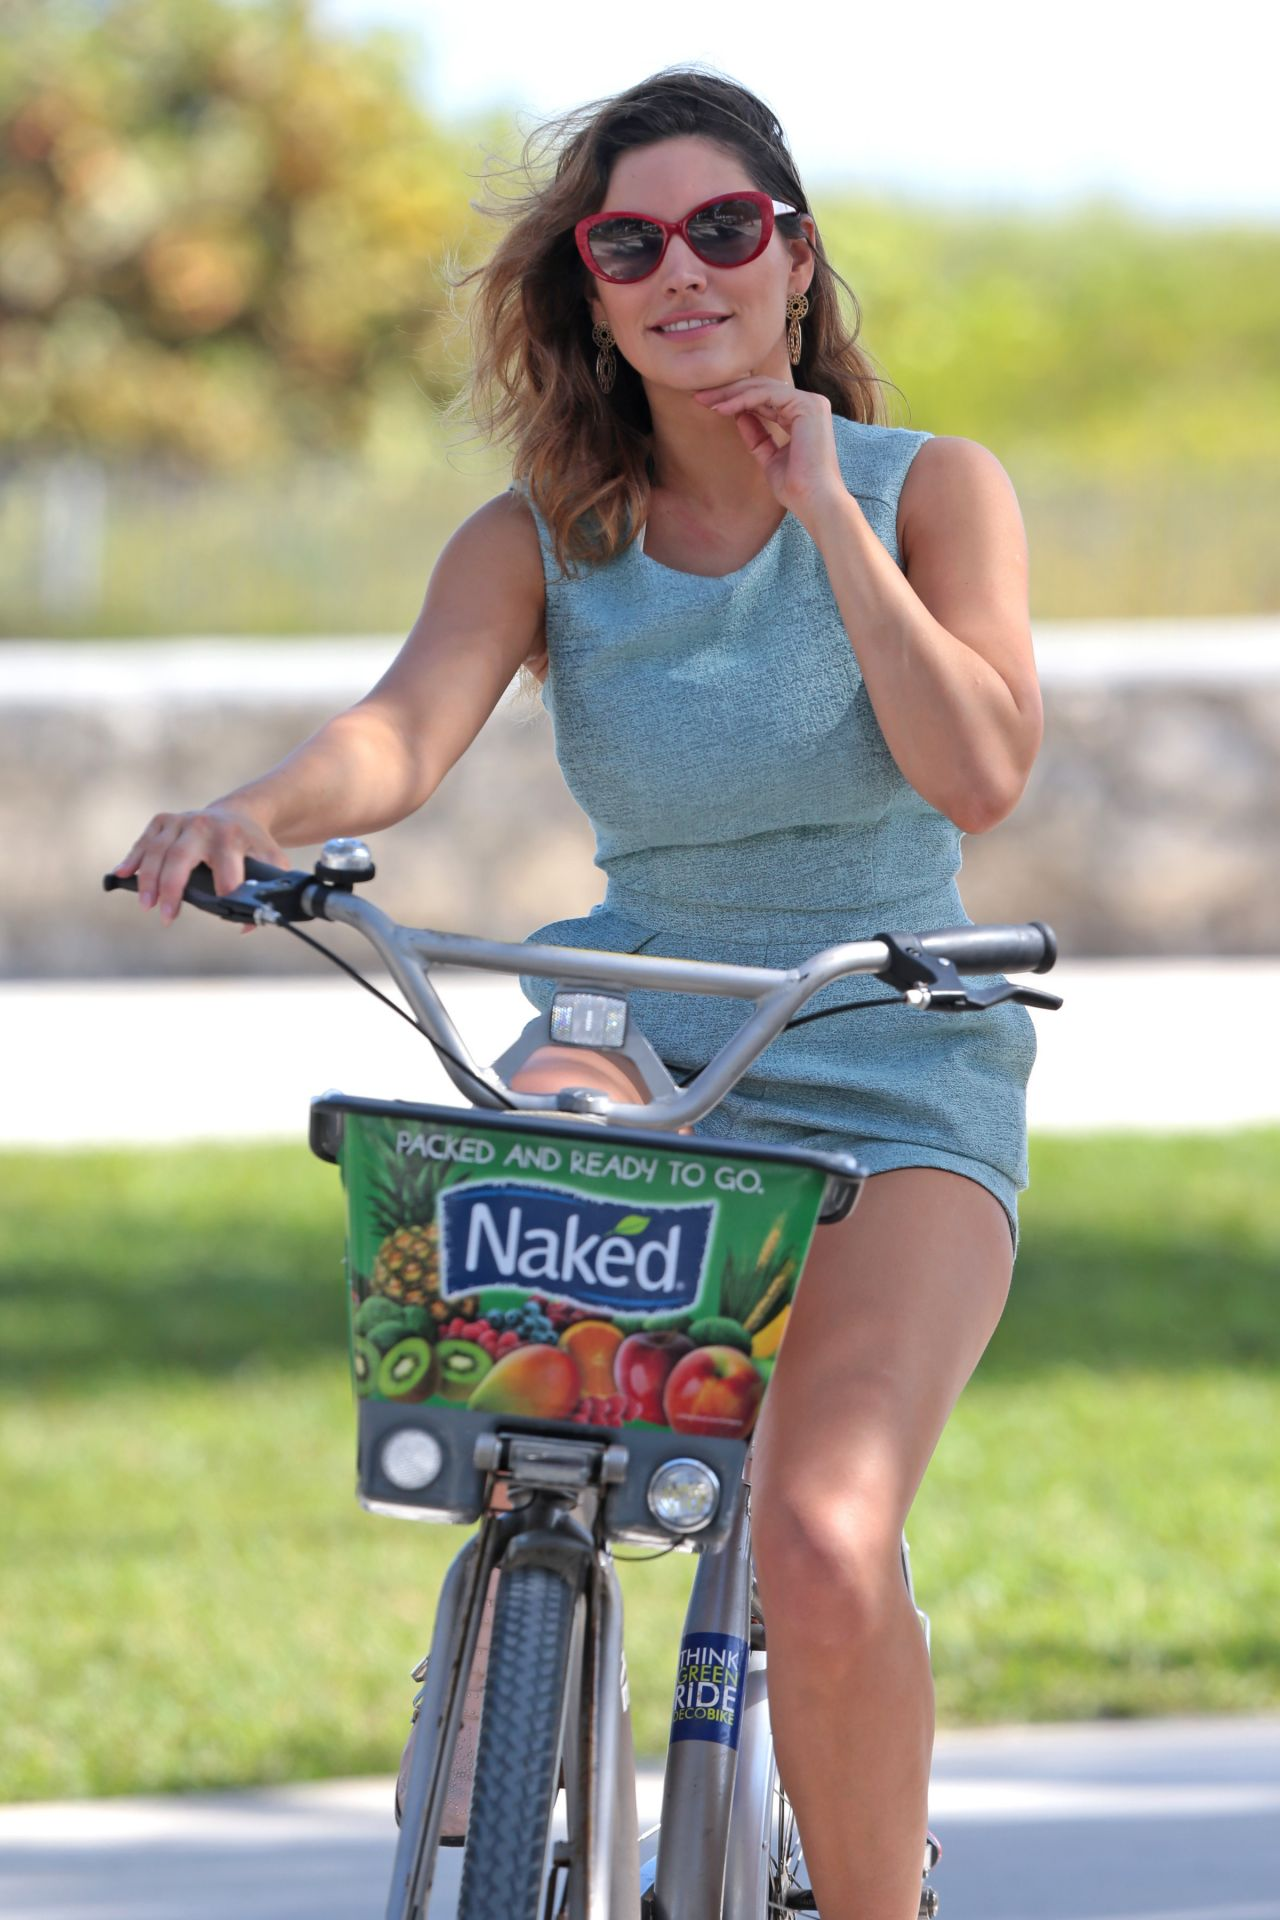 Riding a Bike Wearing a Dress